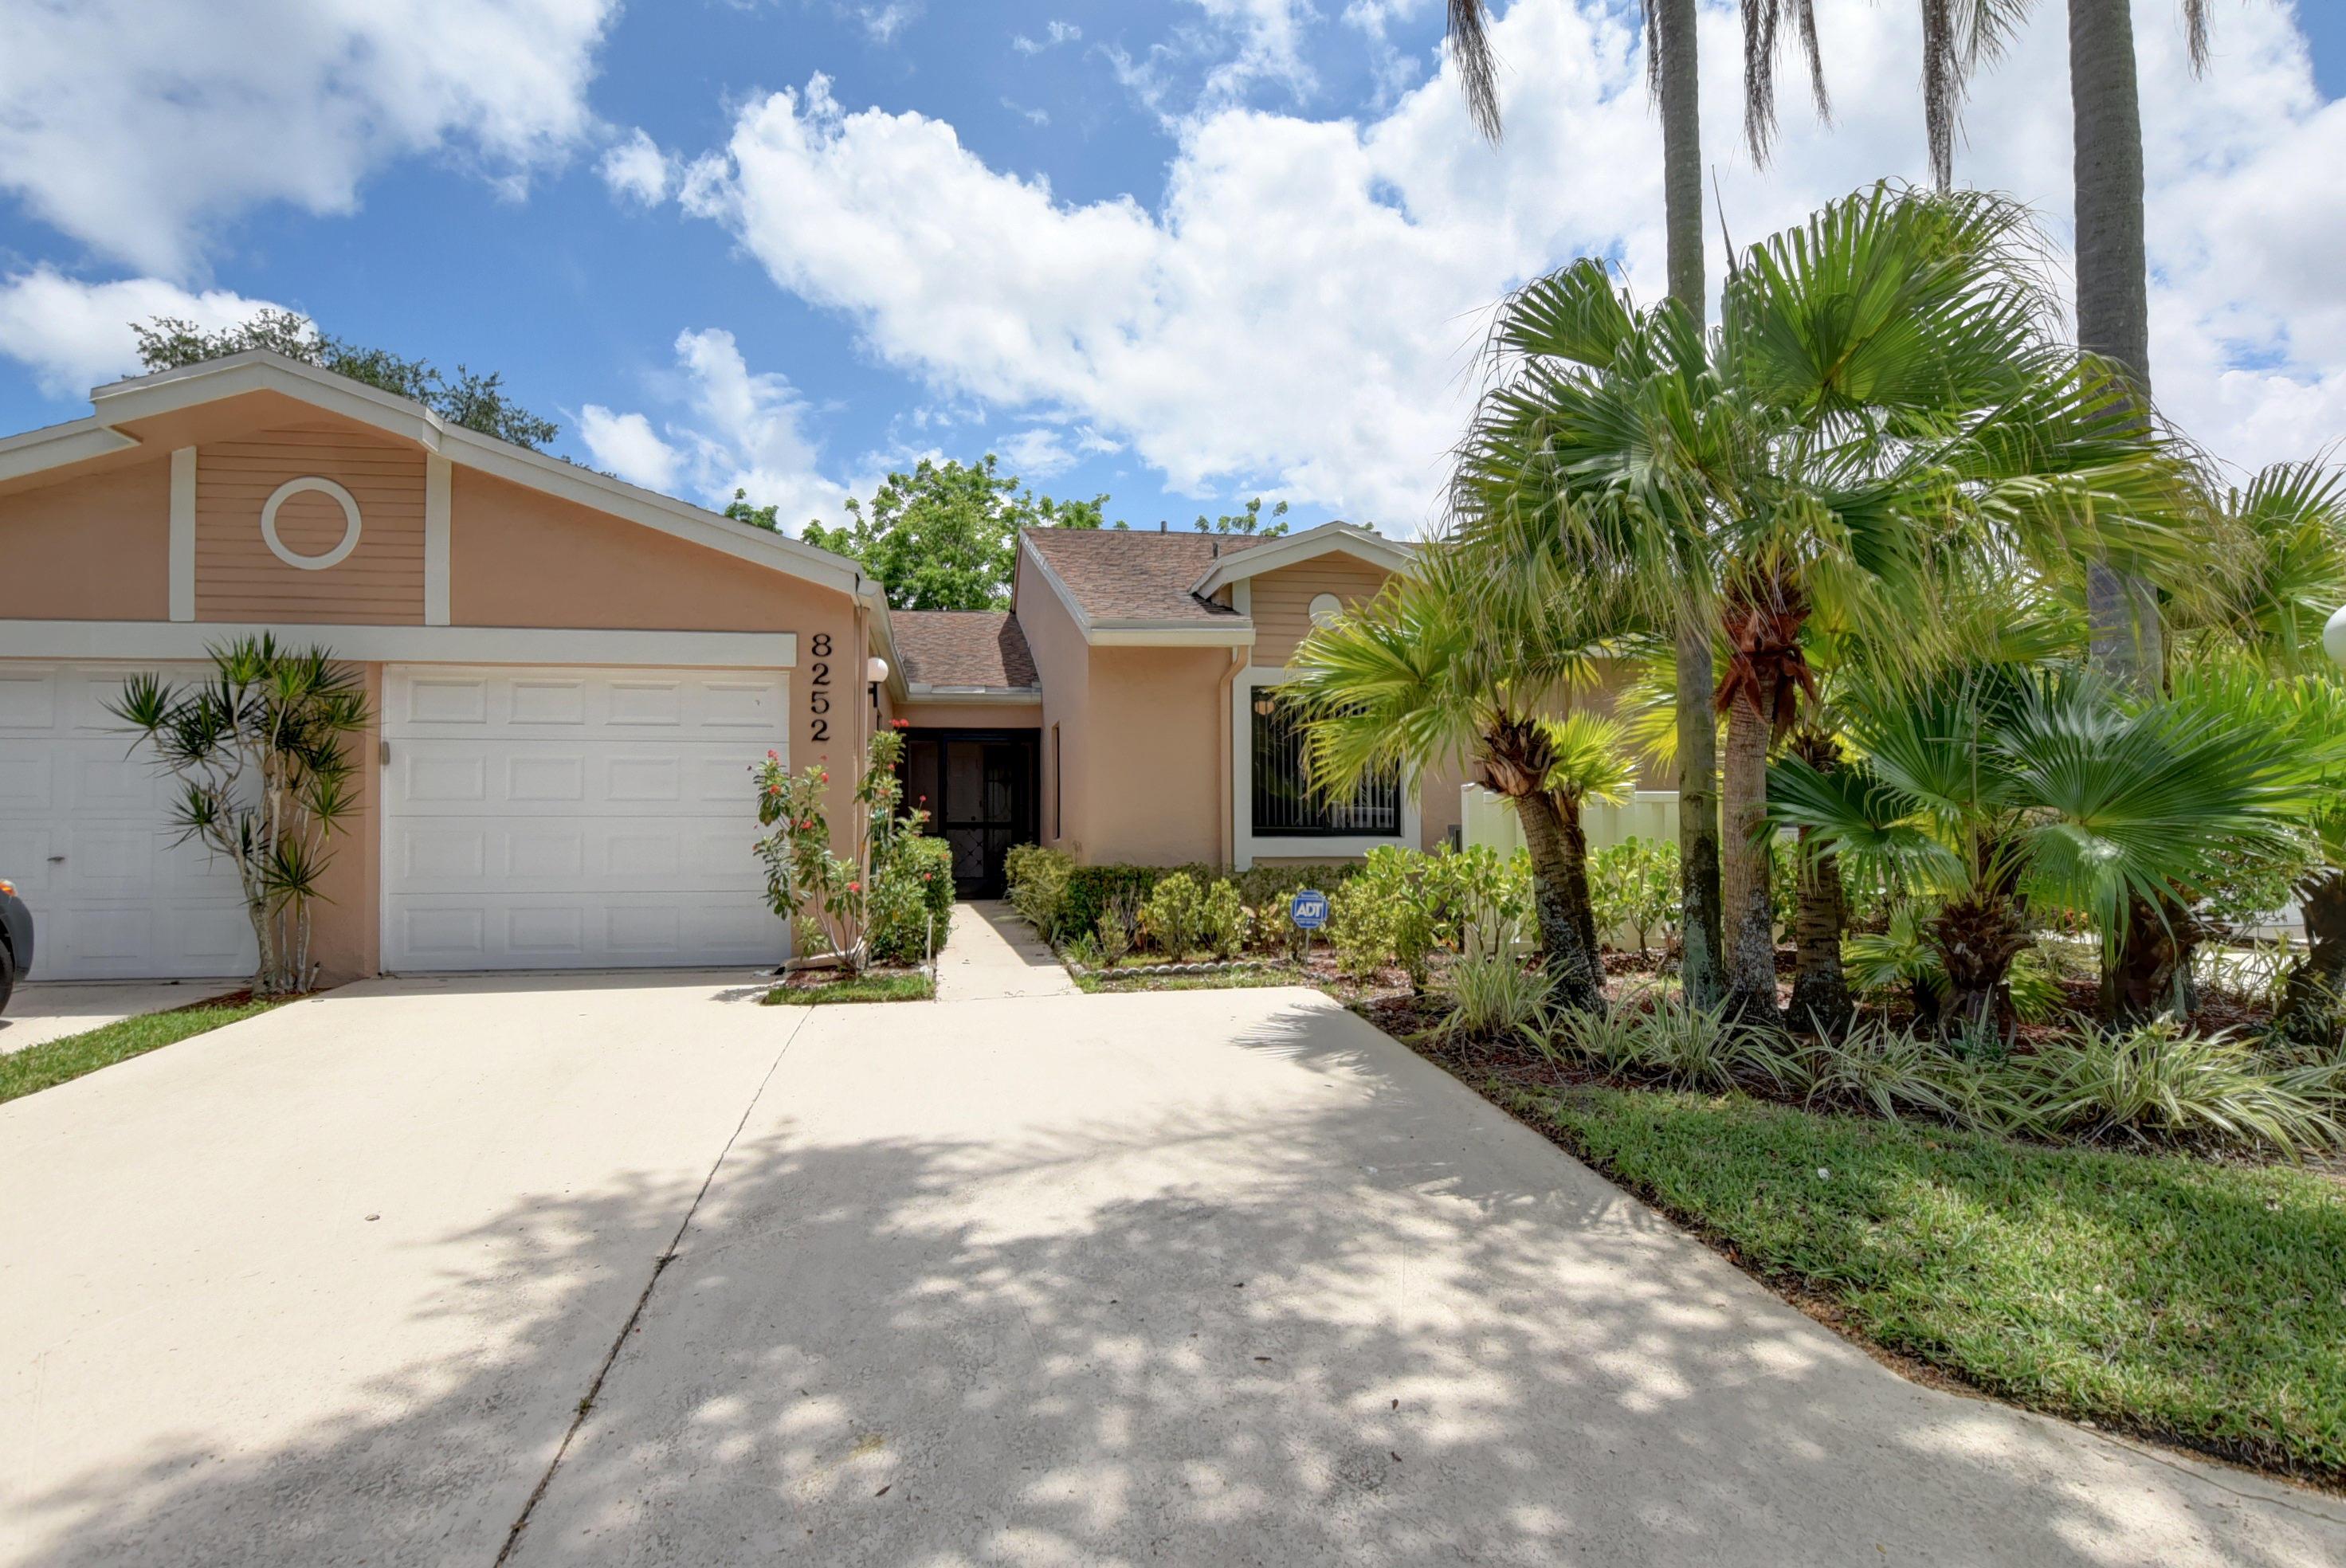 8252 Summerbreeze Lane Boca Raton, FL 33496